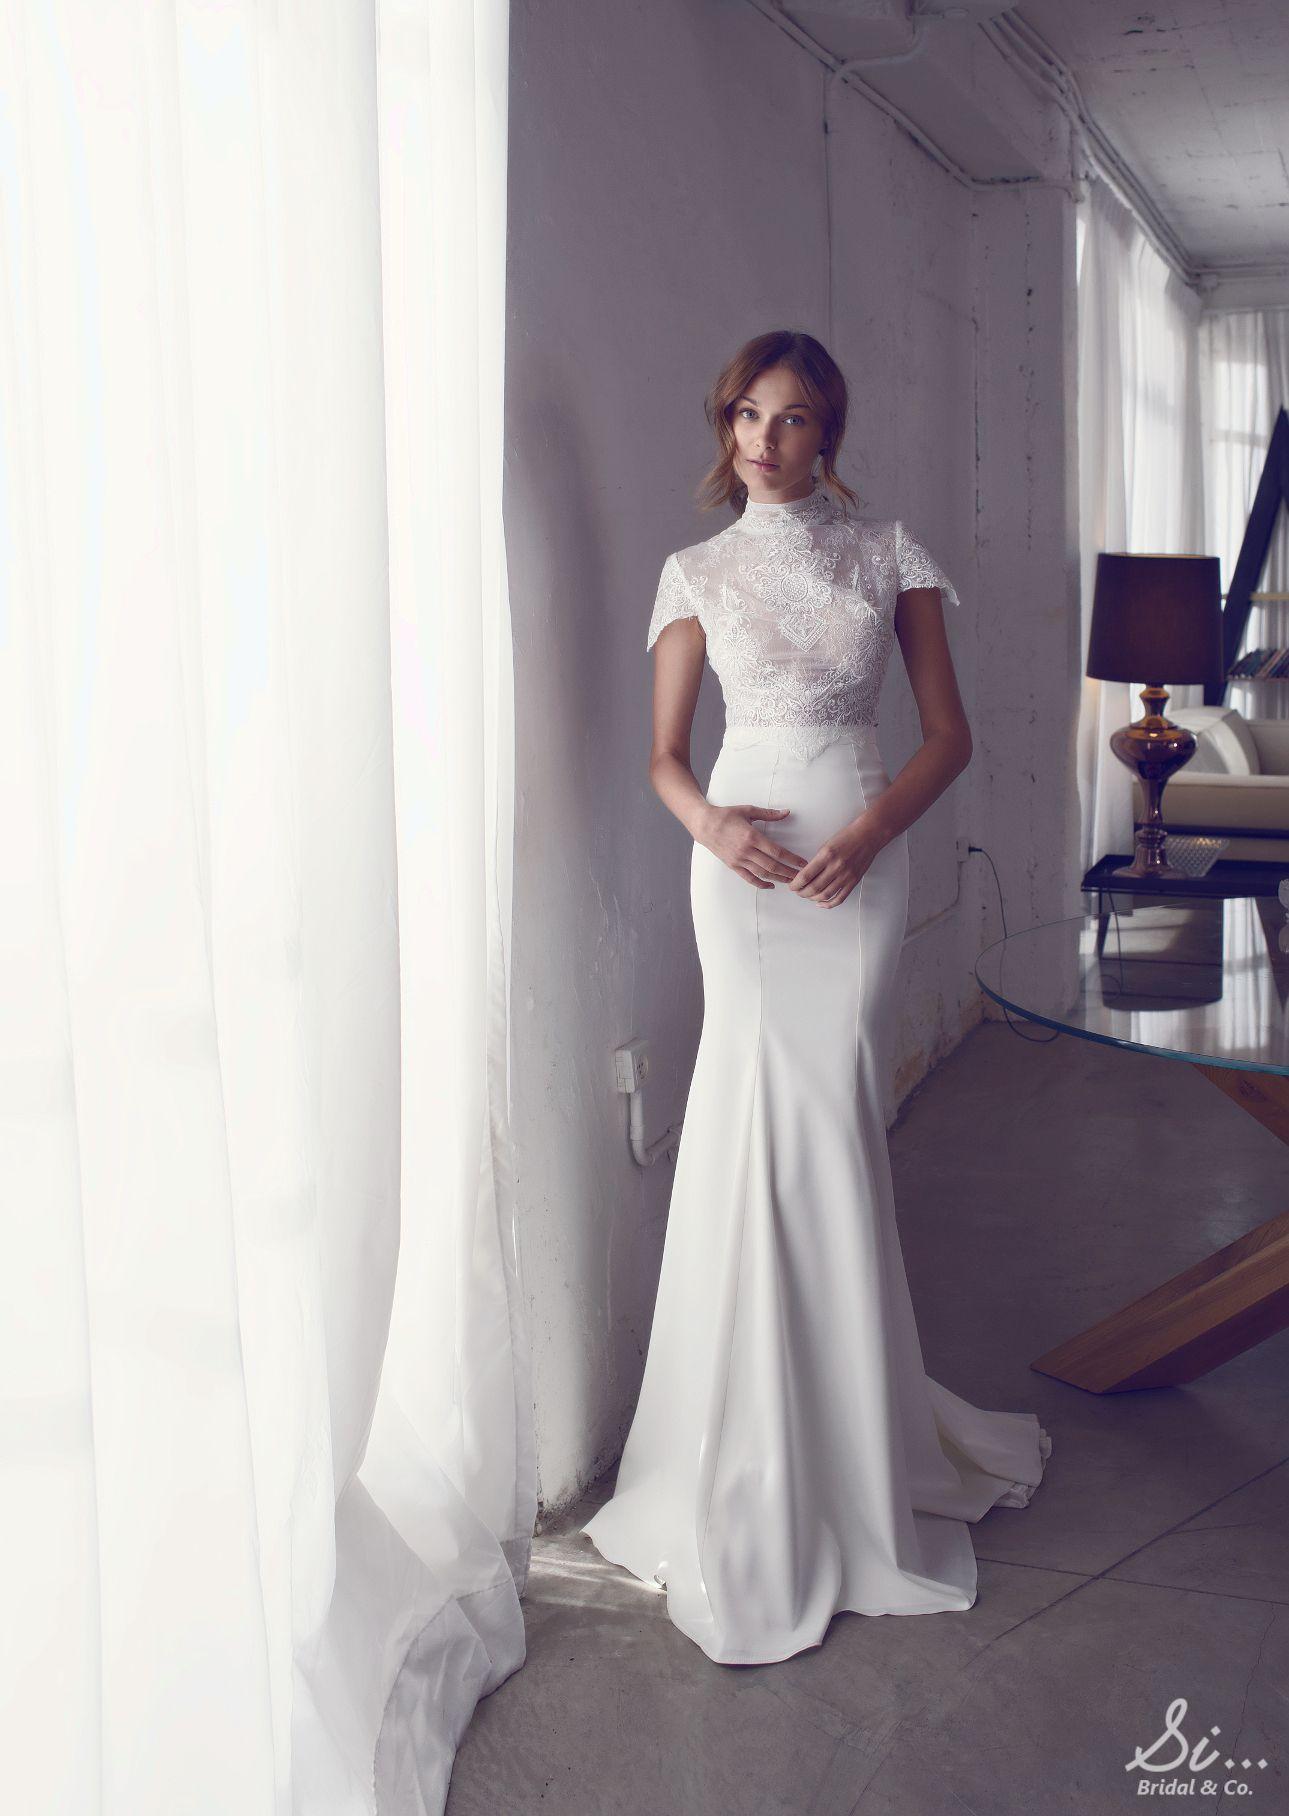 Romi Noya F W 2017 Available At Si Bridal Www Sibridal Com Sibridal Noyabridal Noya Rikidalal Bridal Wedding Dresses Designer Wedding Dresses Bridal